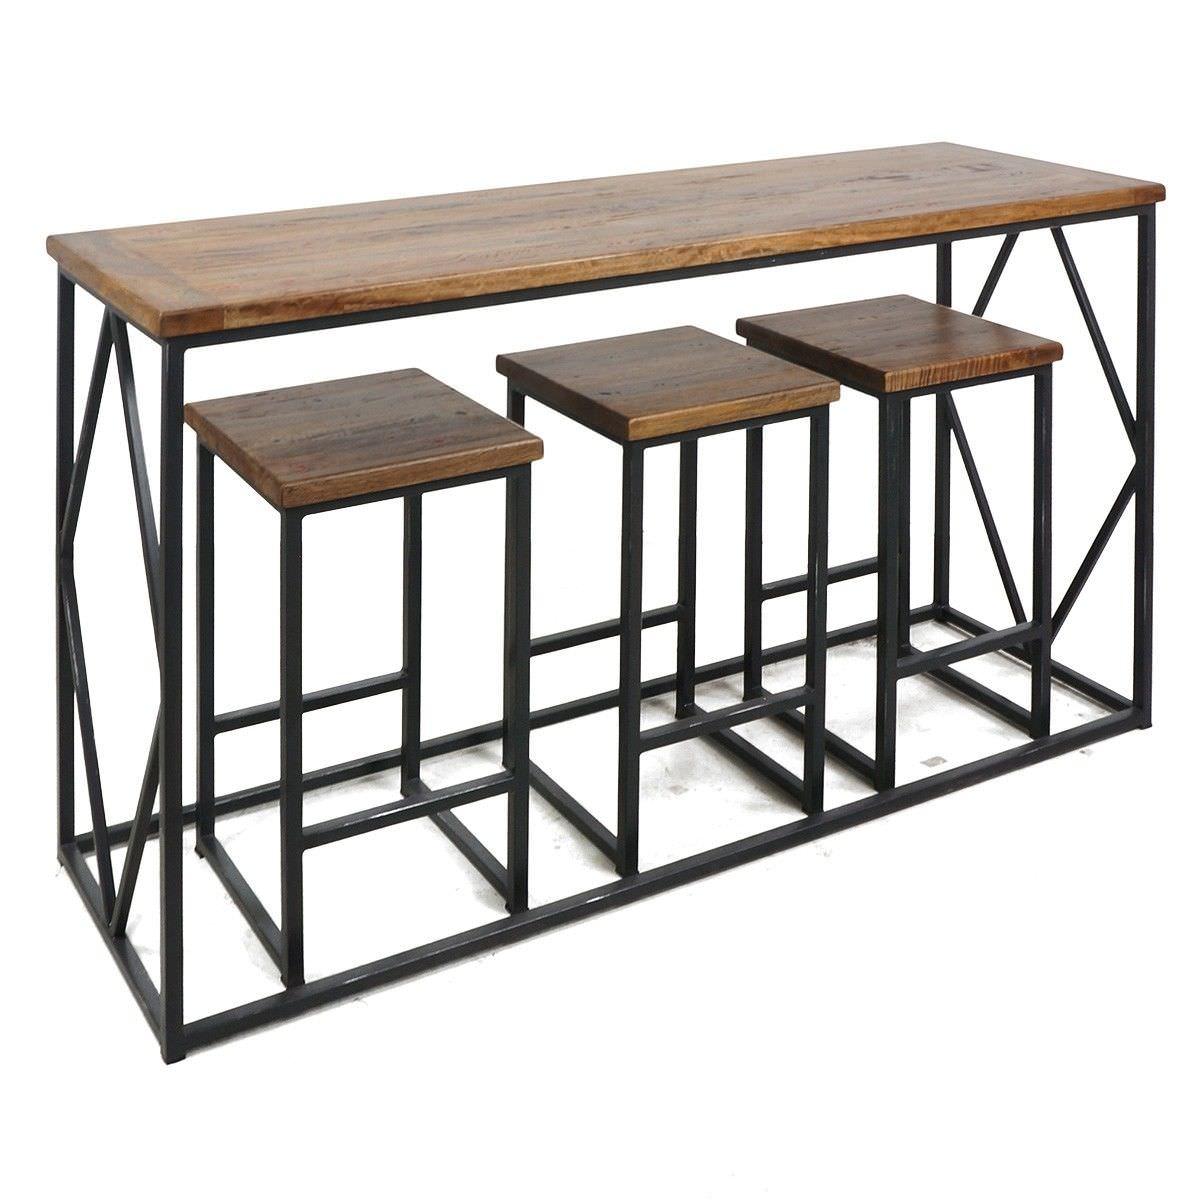 Alfresco 4 Piece Timber & Steel Breakfast Bar Set